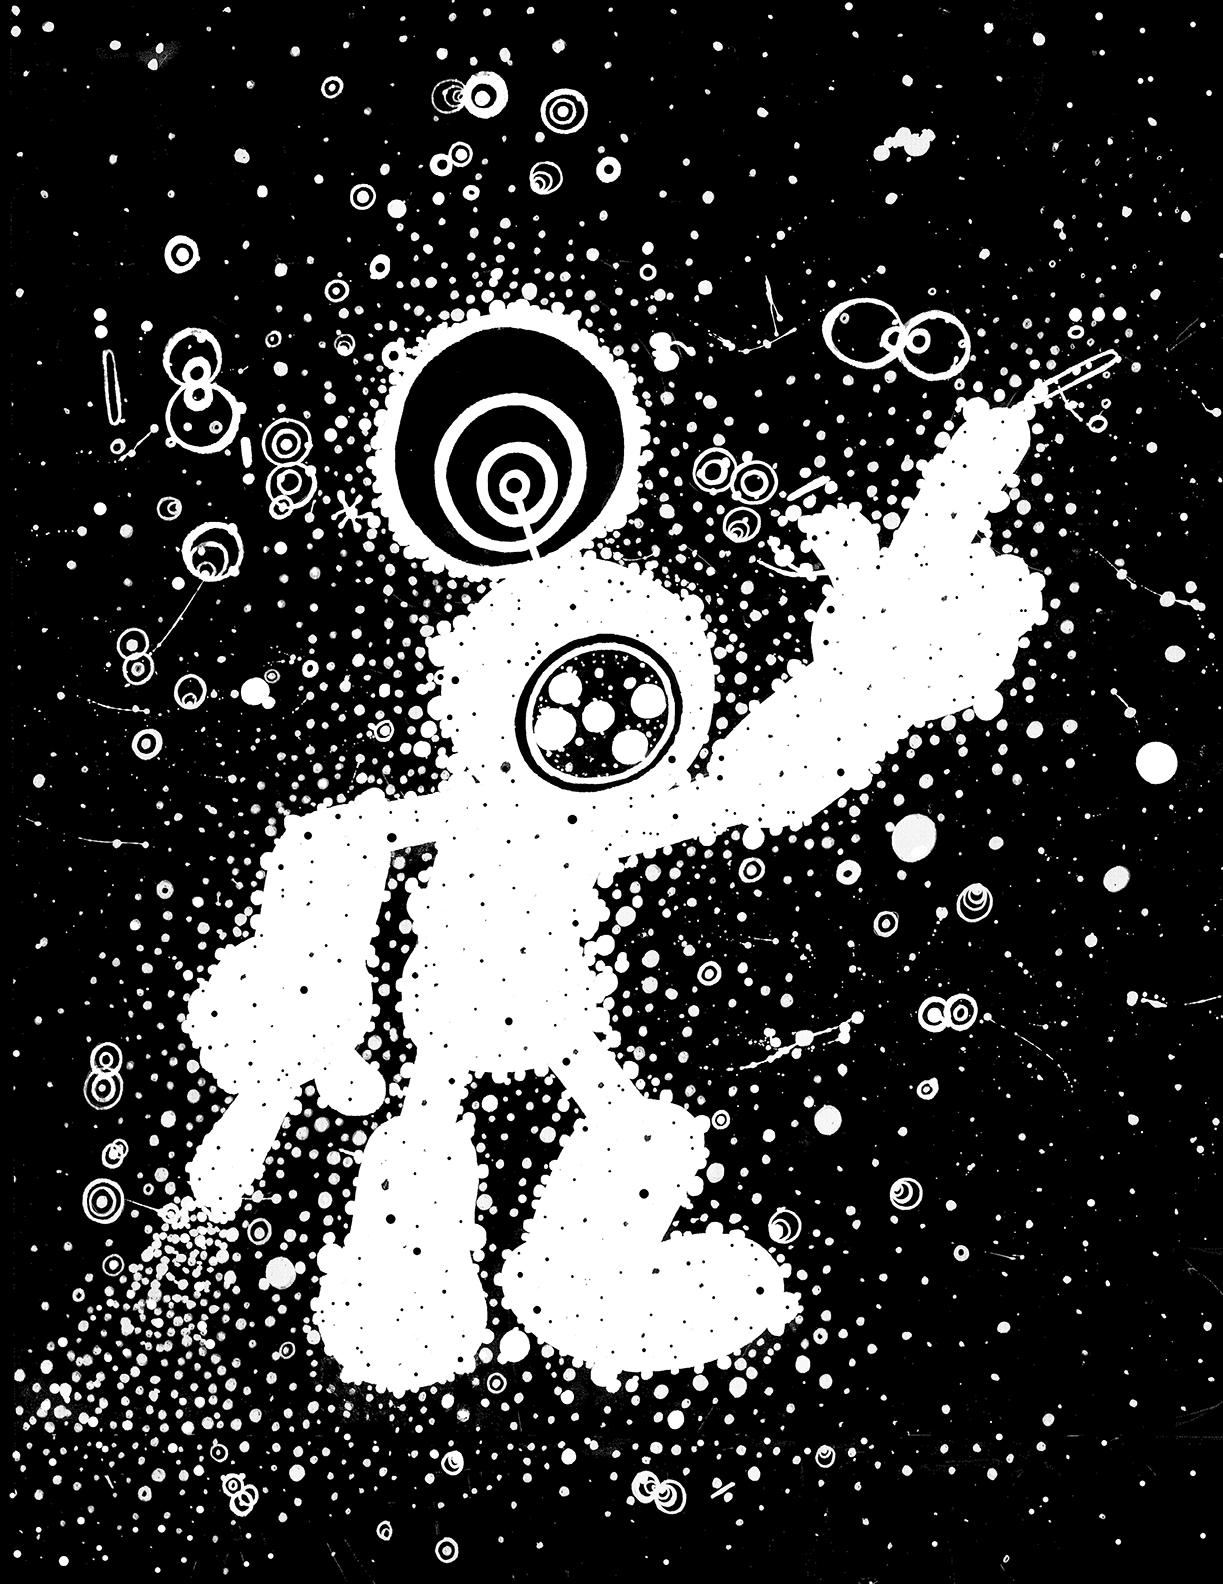 SPACE:MAN Cometh